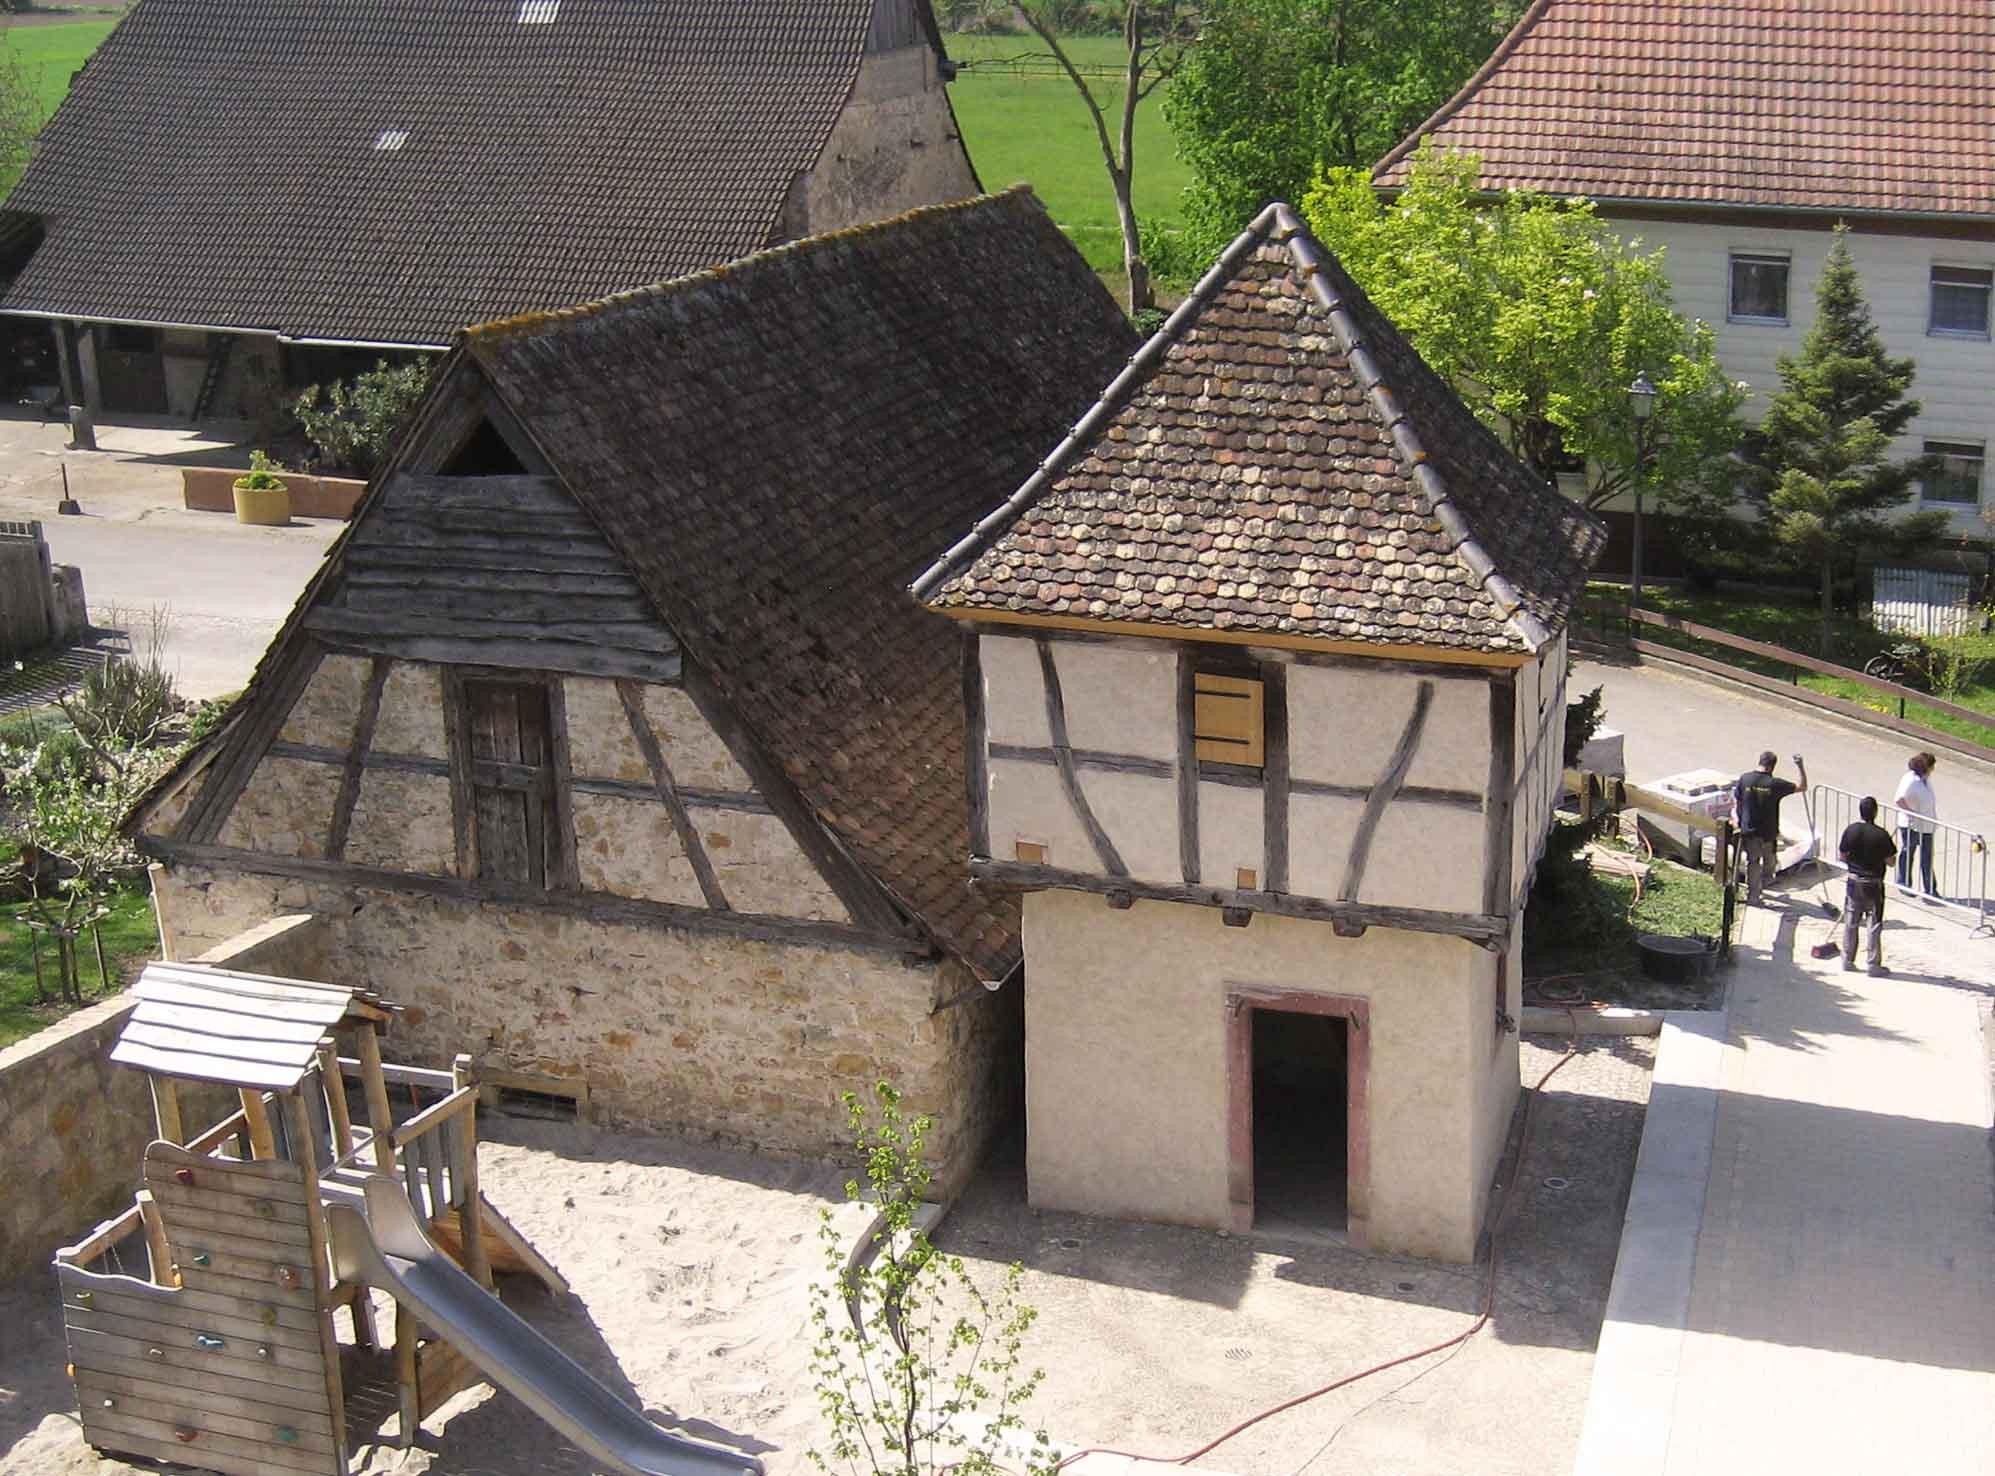 Der fertige Taubenturm in Grezhausen